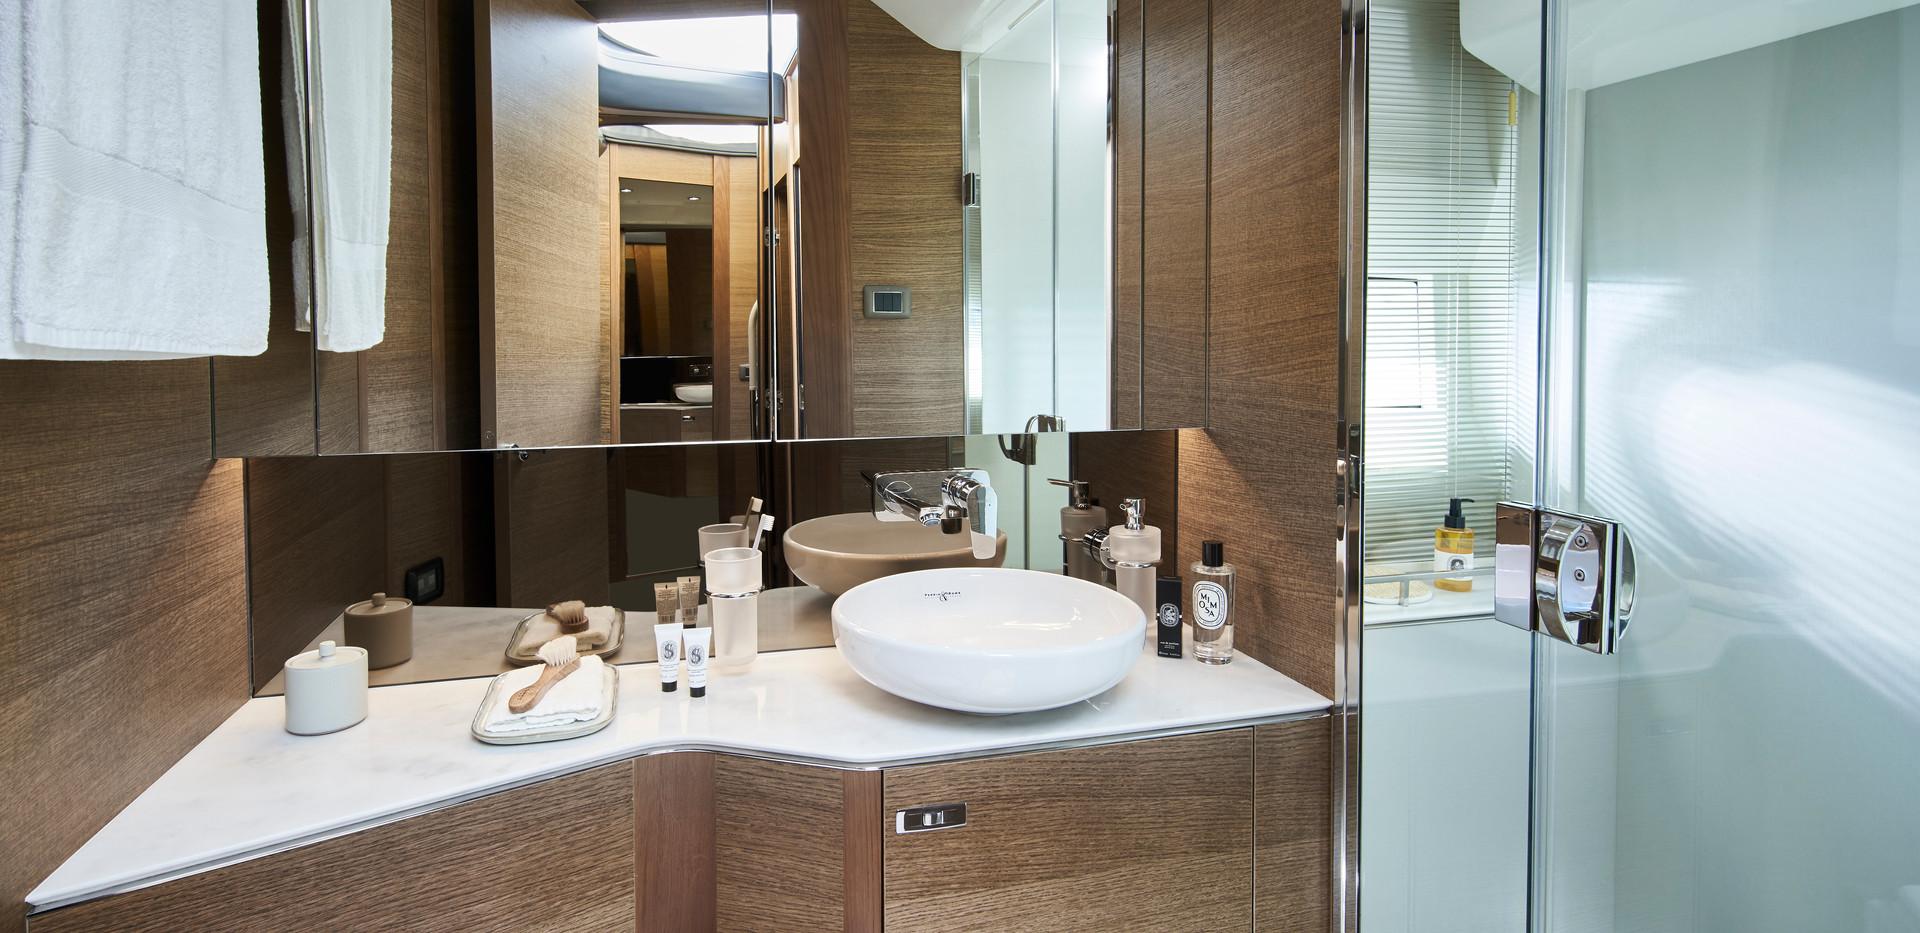 f45-interior-forward-bathroom-rovere-oak